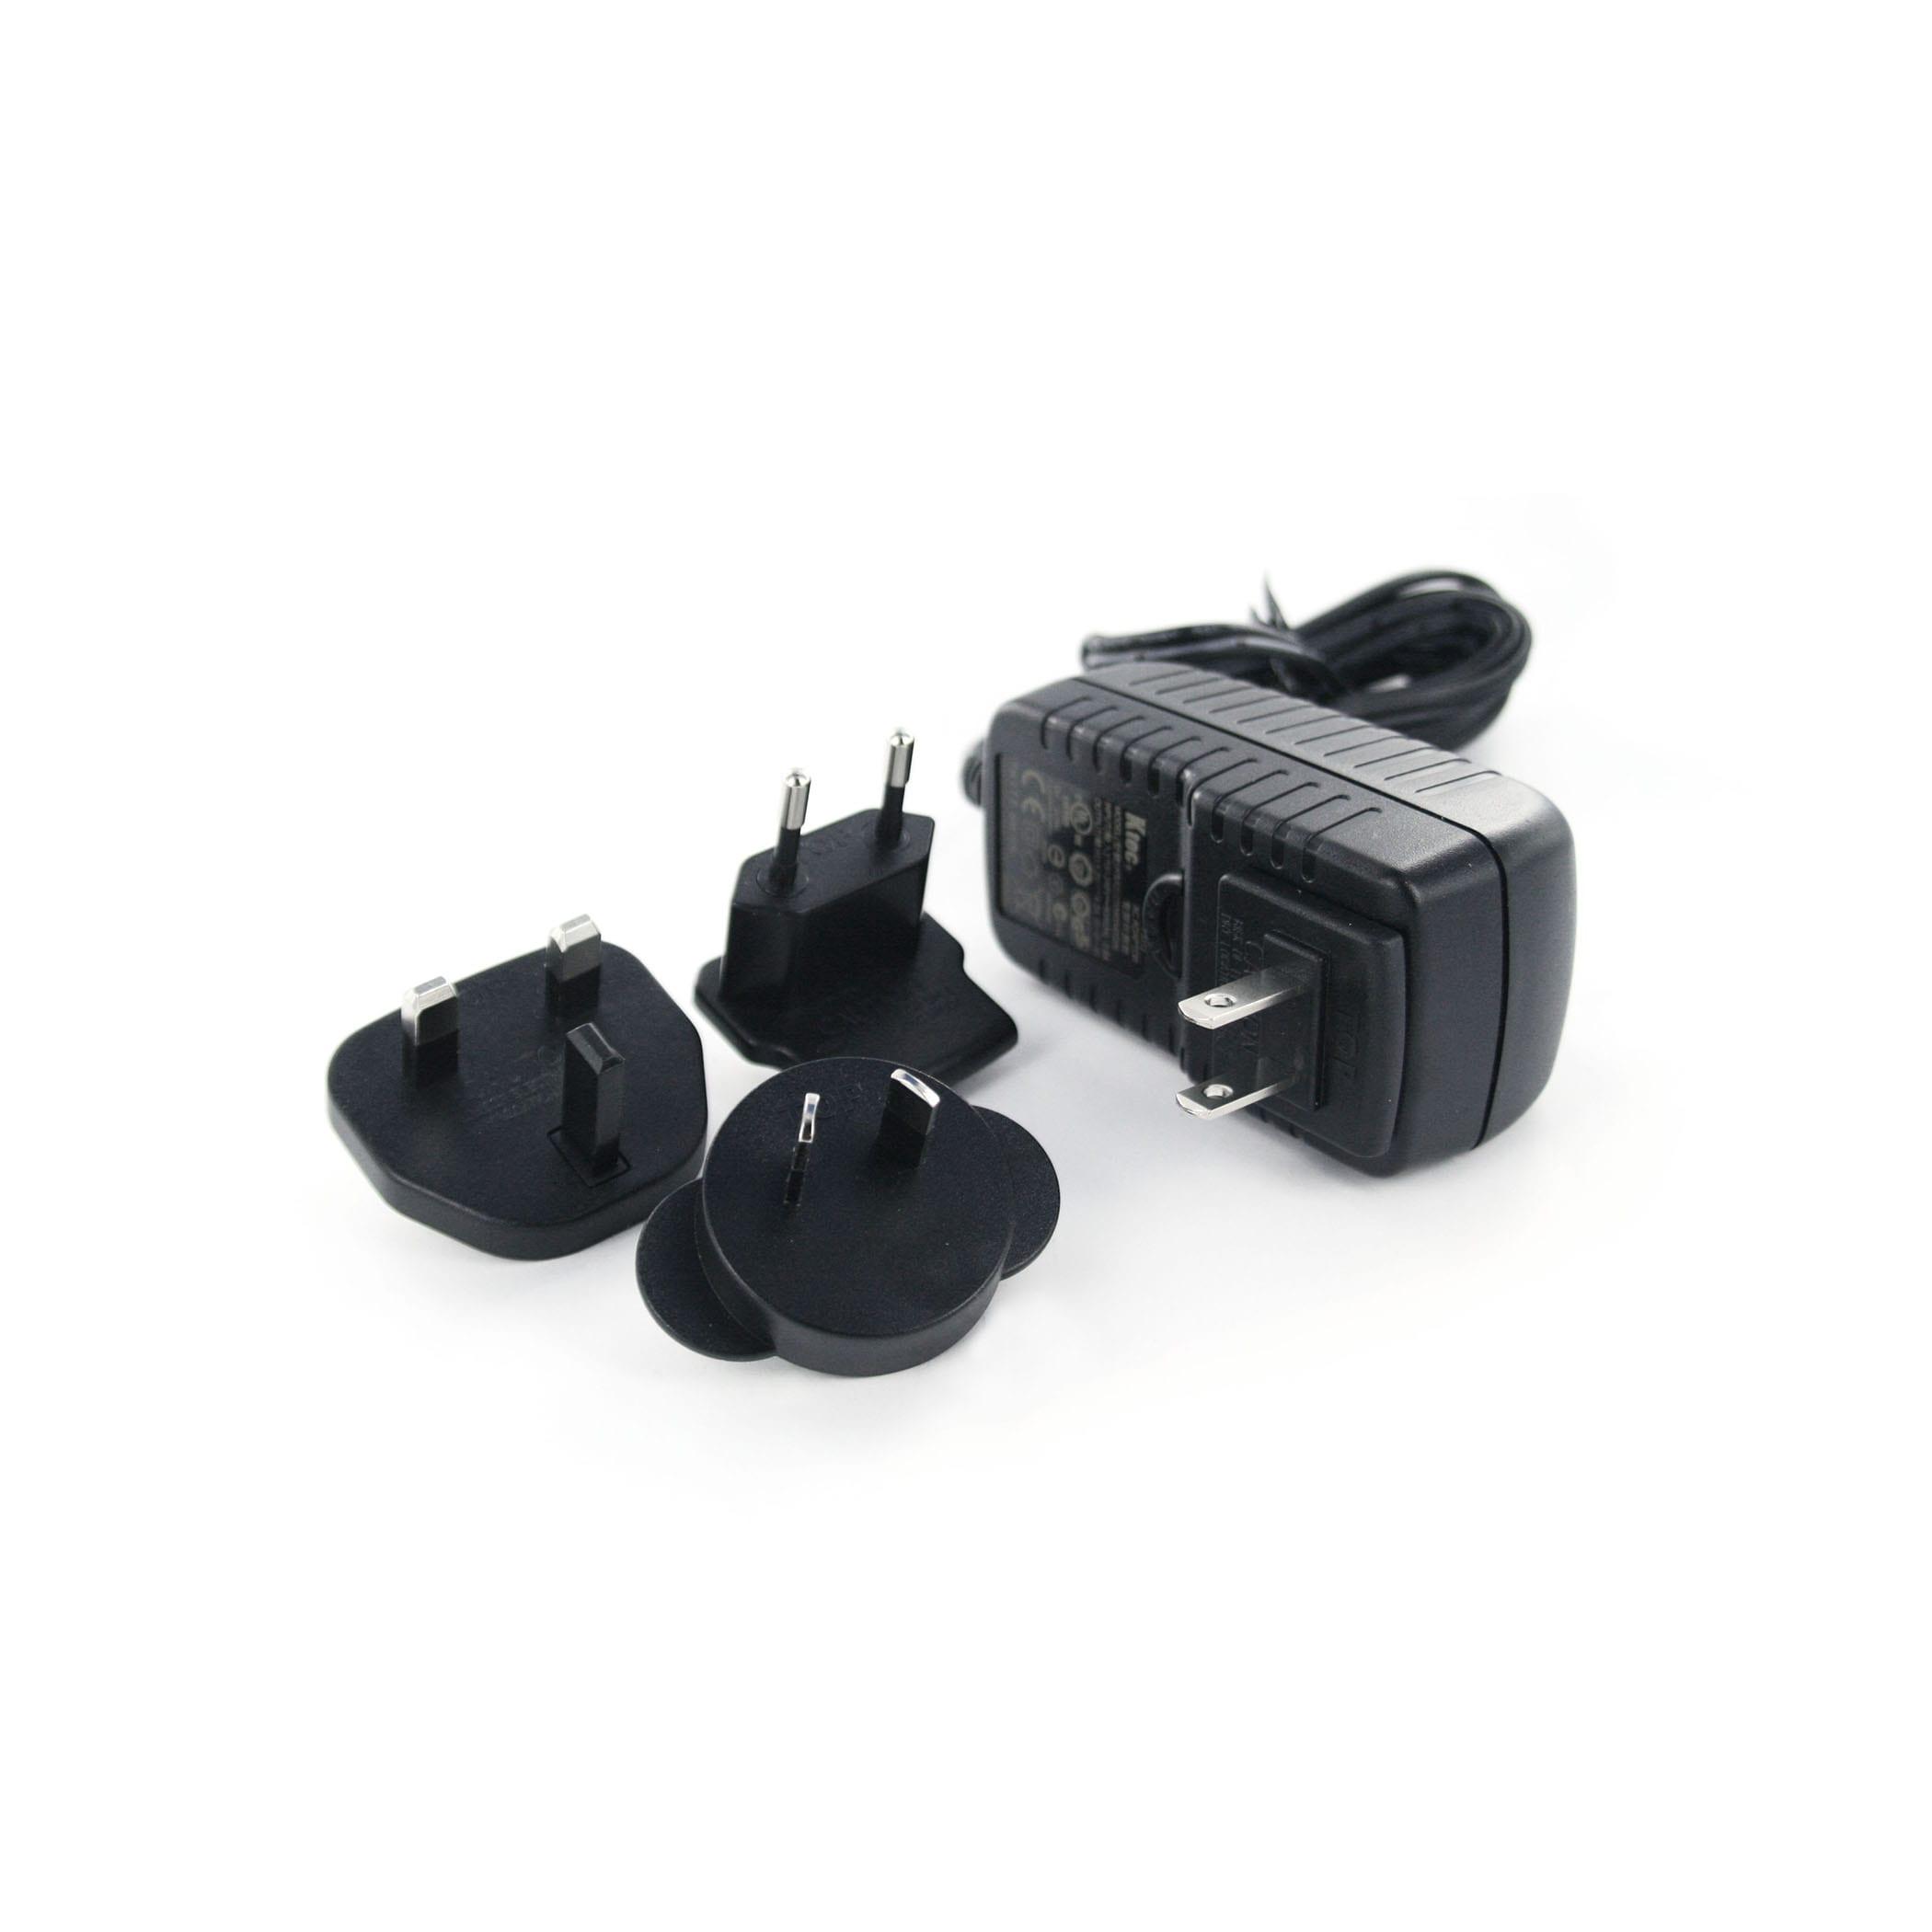 Kanex AC Power Adapter for USB3GBIT3X